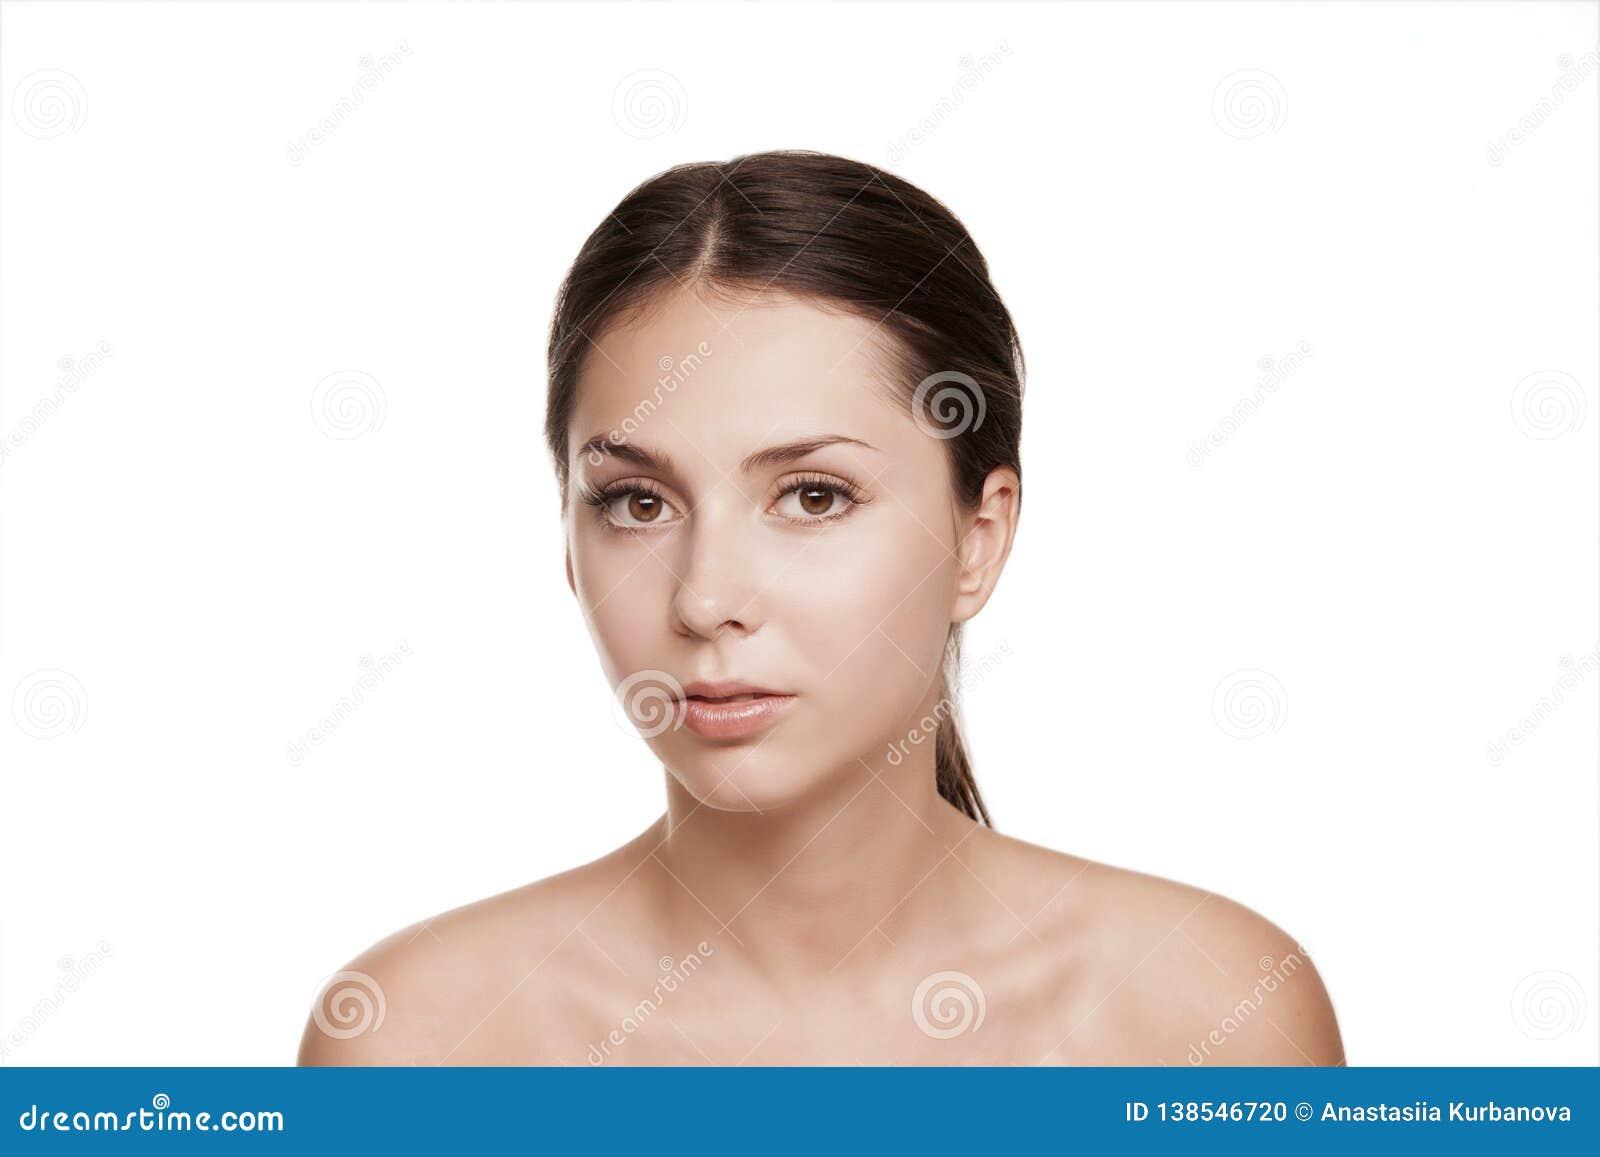 Estúdio bonito da cara da mulher no branco, cosmetologia dos termas